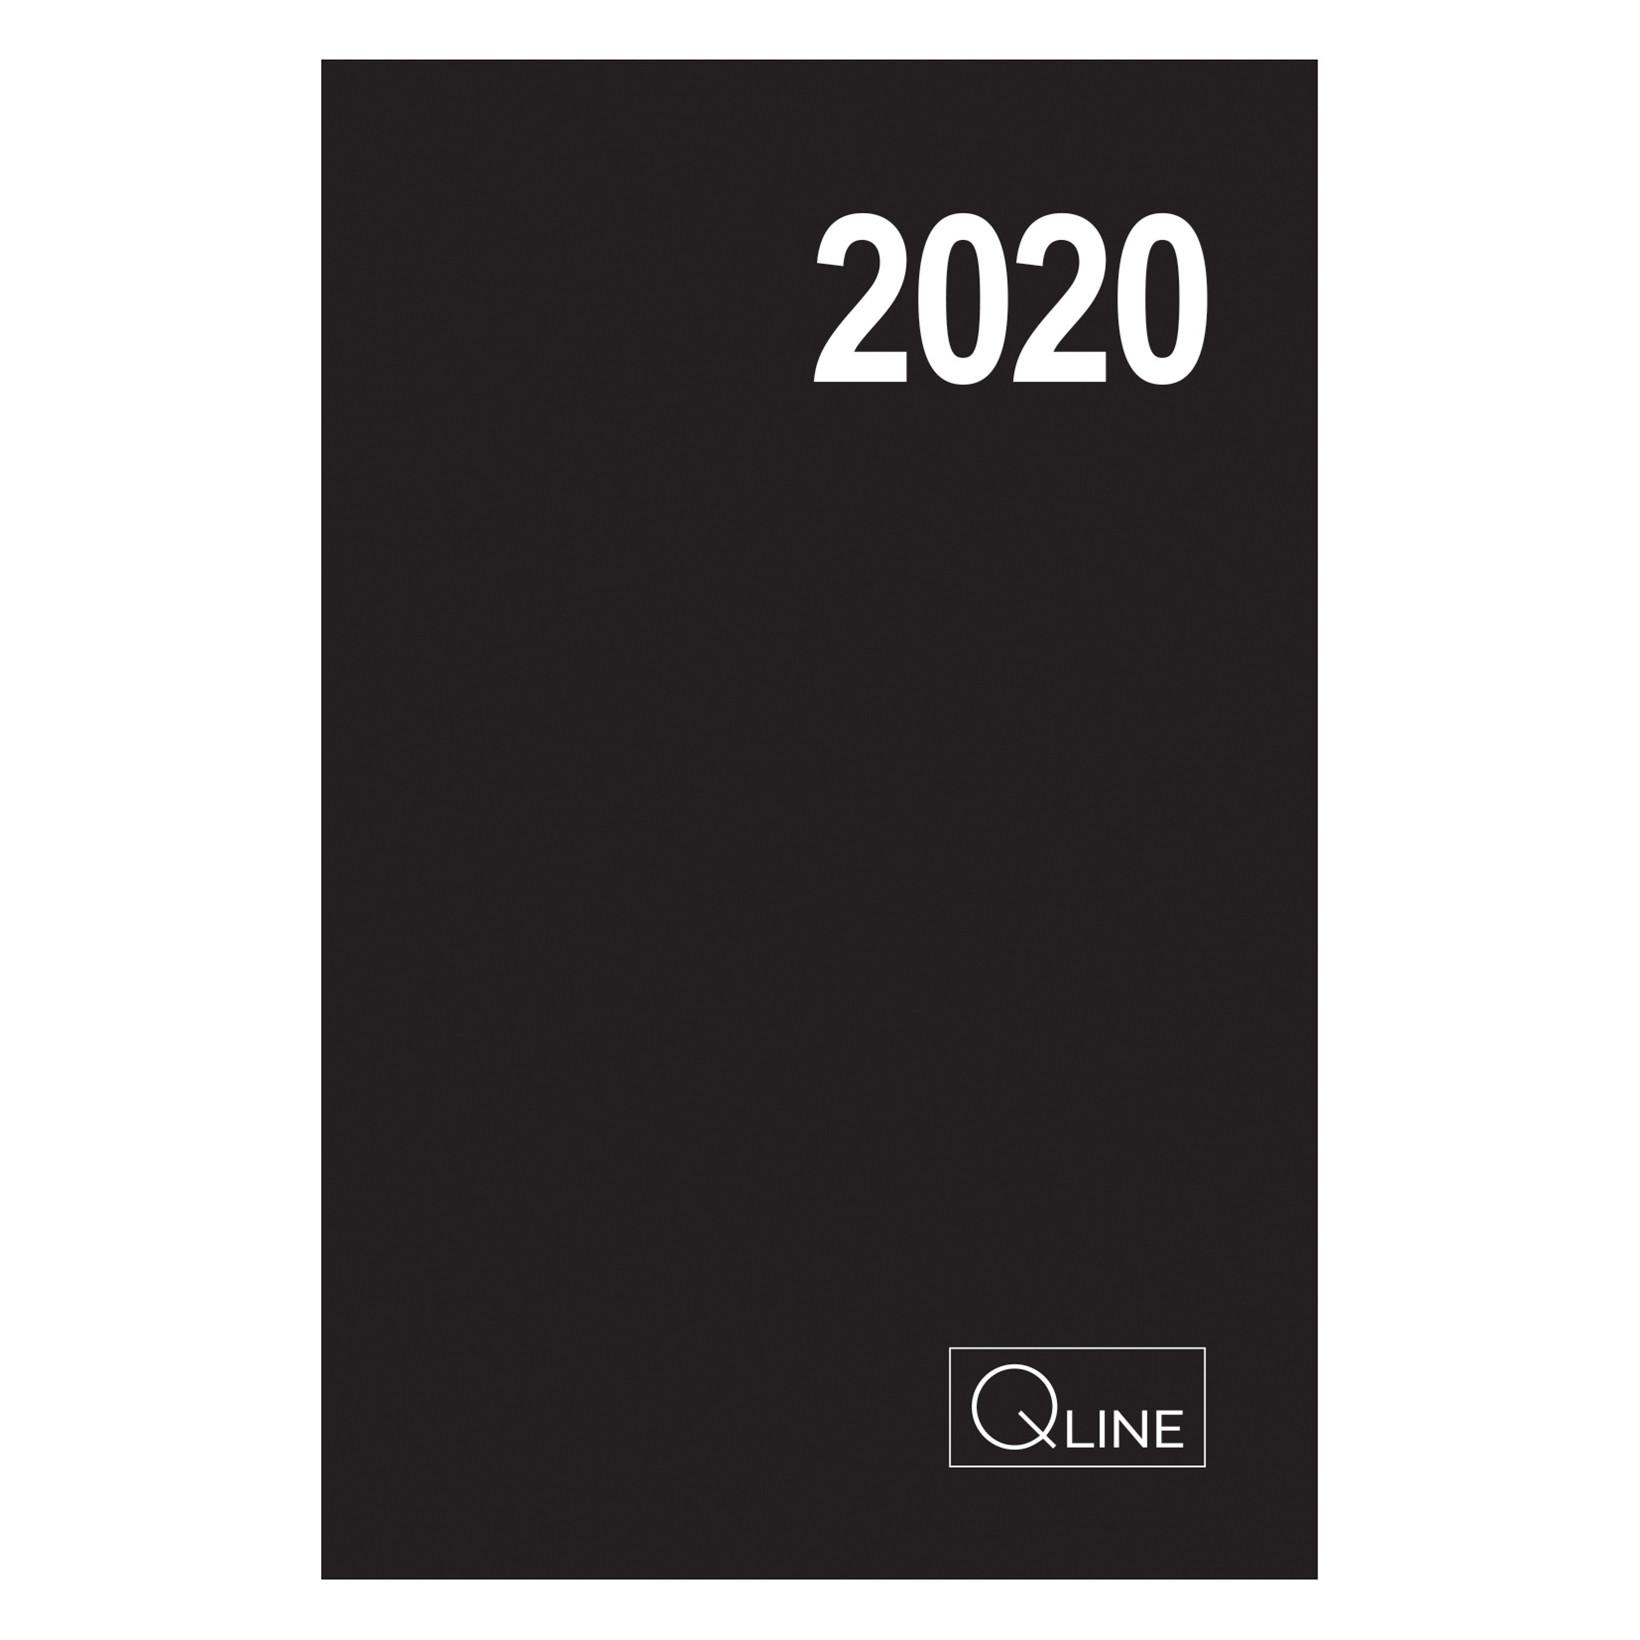 Spiralkalender Q-line 2020 12x17cm 1dag per side 20 2111 00